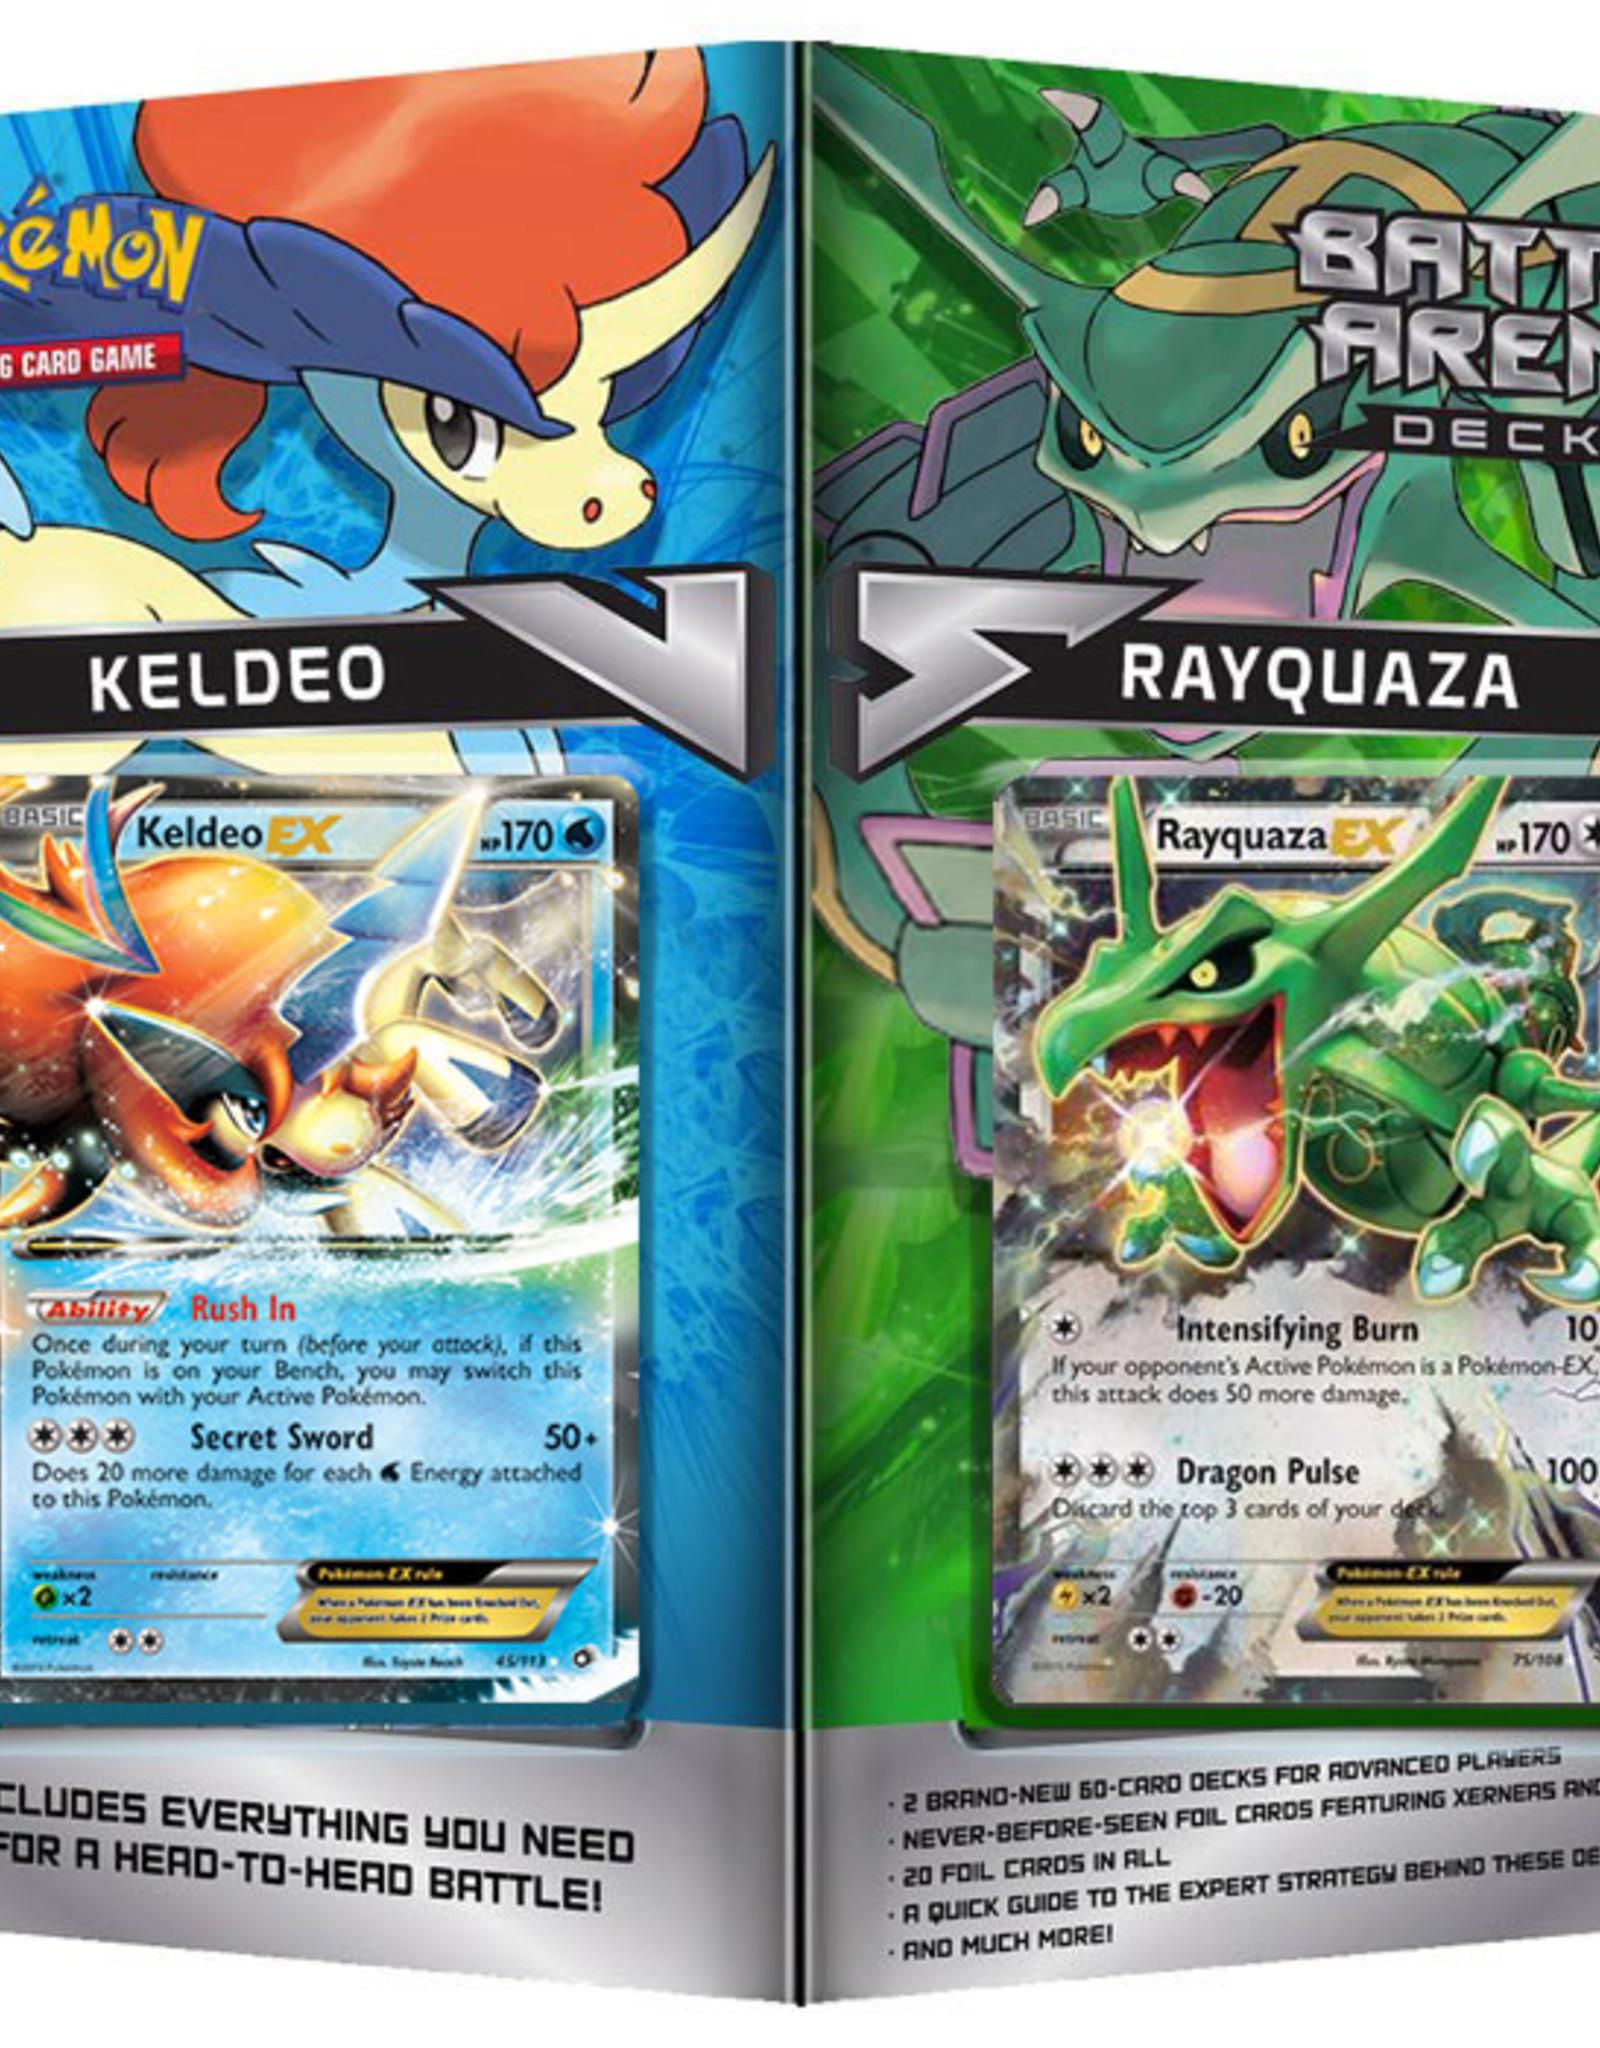 Pokemon Battle Arena Decks (Rayquaza VS. Keldeo)